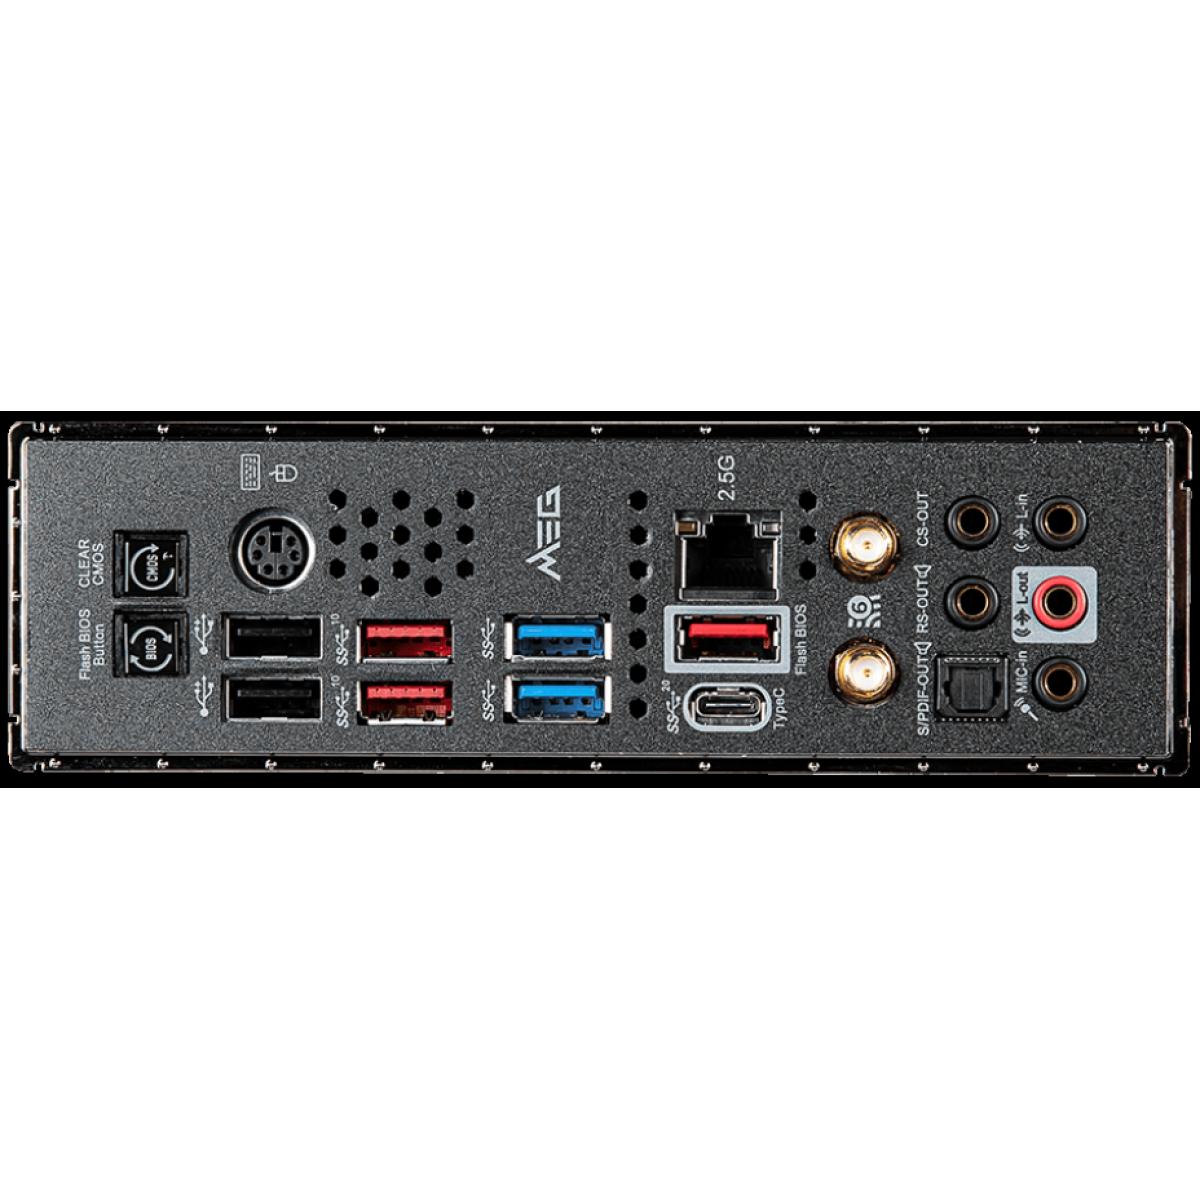 Placa Mãe MSI, MEG Z490 Unify, Chipset Z490, Intel LGA1200, ATX, DDR4